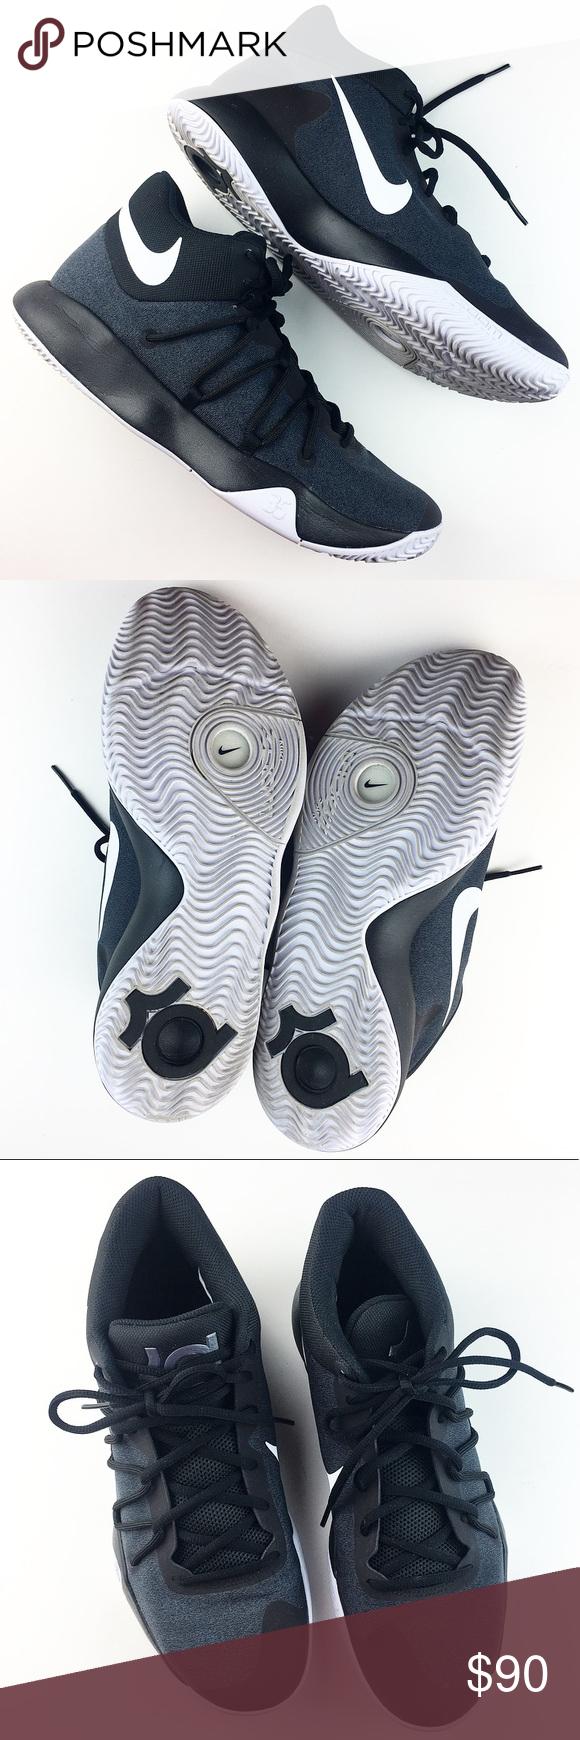 Nike Men's KD Trey 5 V Basketball Shoes Size 10.5